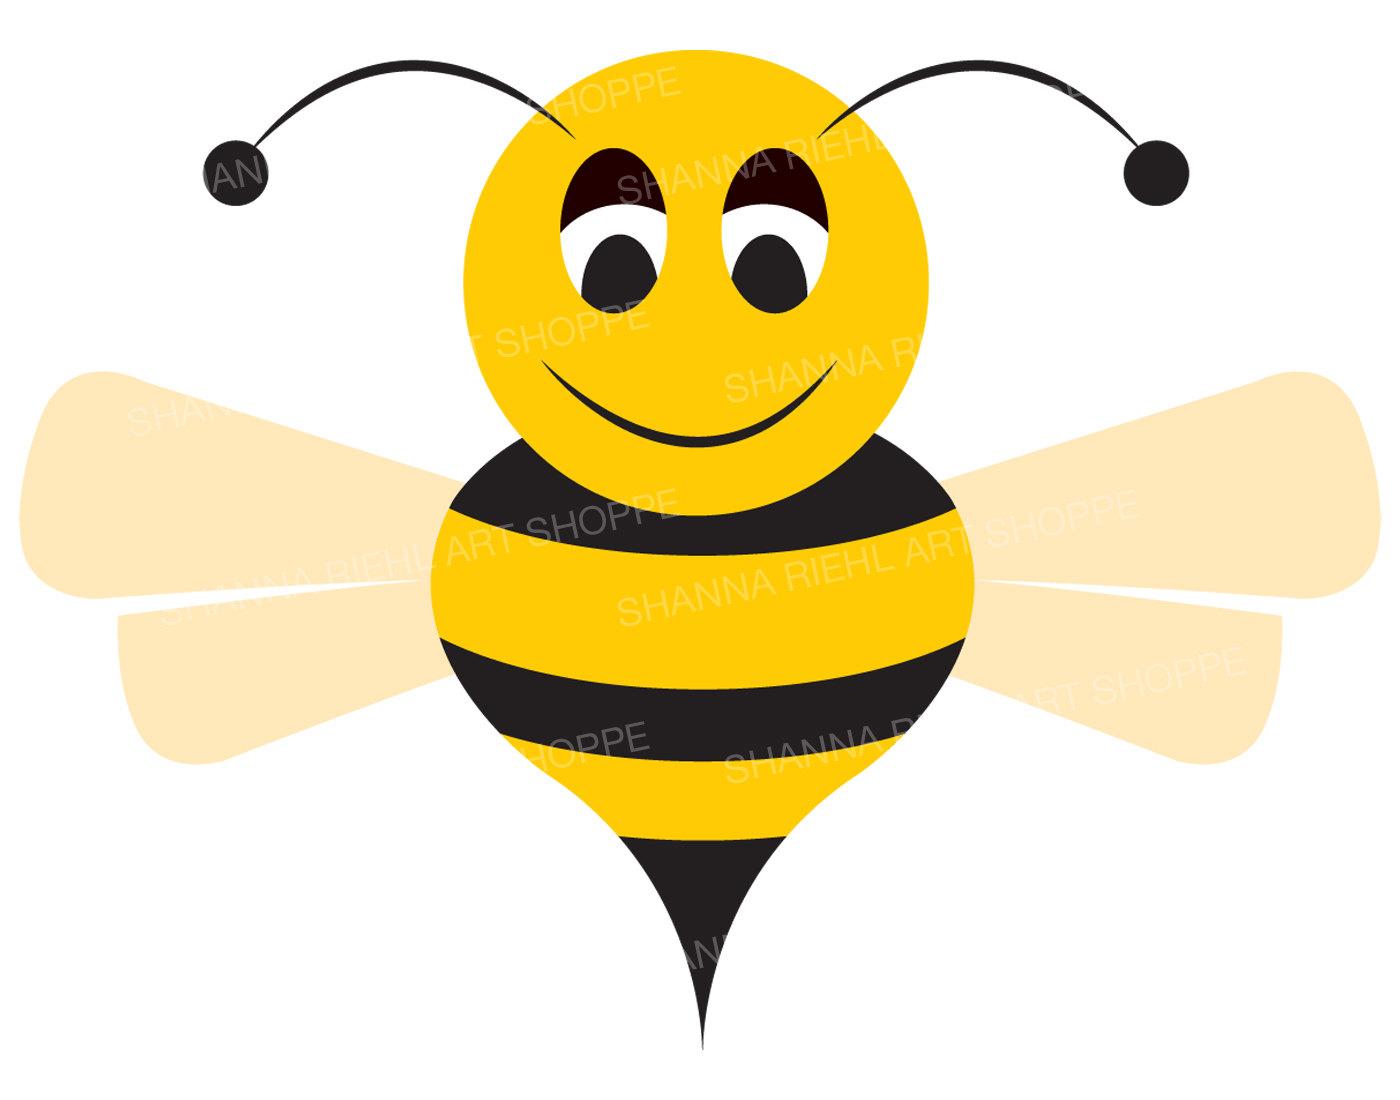 1400x1100 Bumble Bee Honey Bee Art Bumblebeemercial Use Nursery Clipart